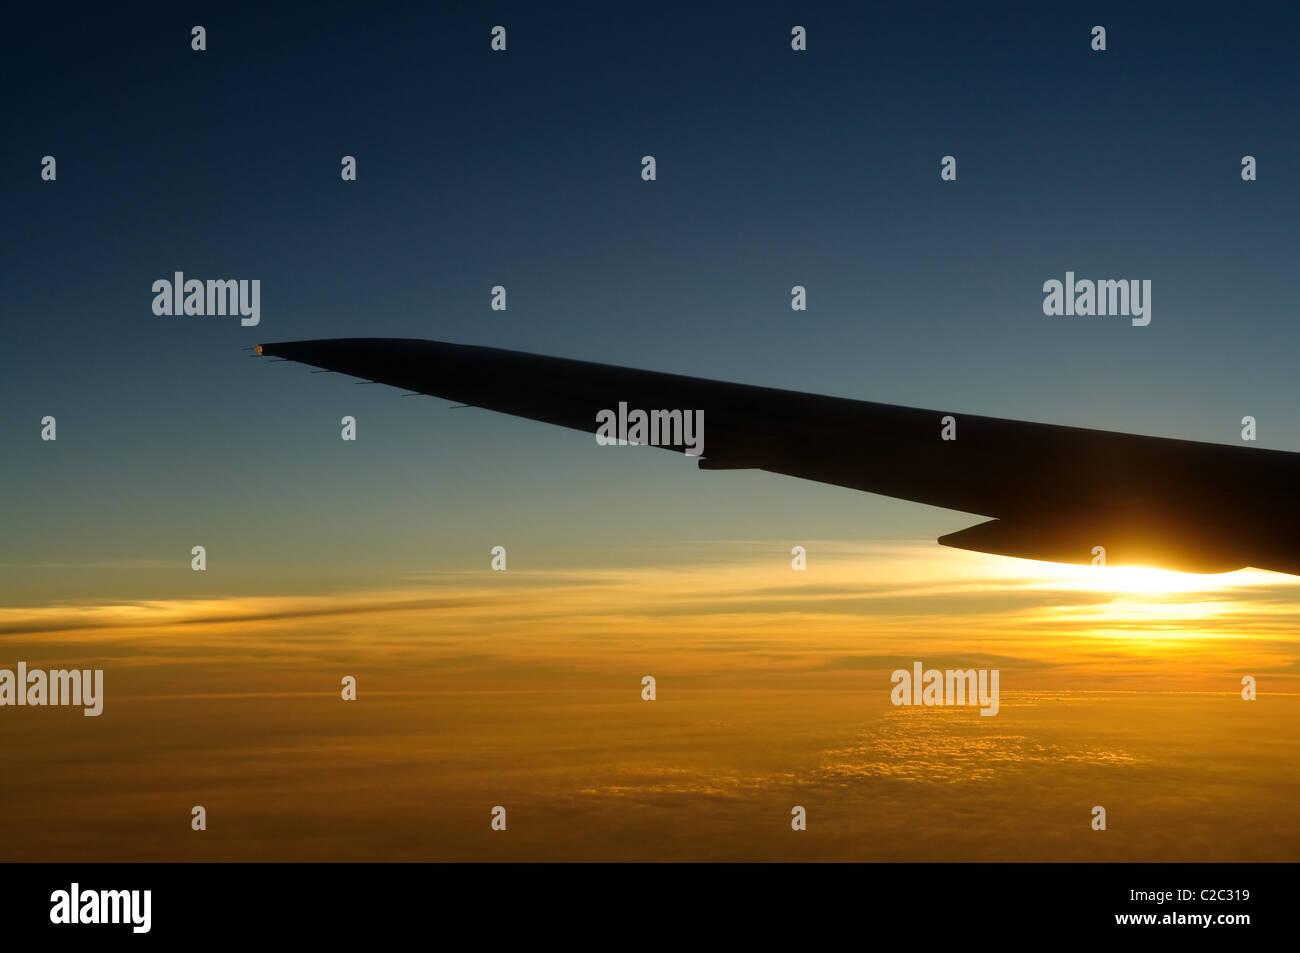 Sonnenuntergang unter Flugzeug Flügel skyline Stockbild